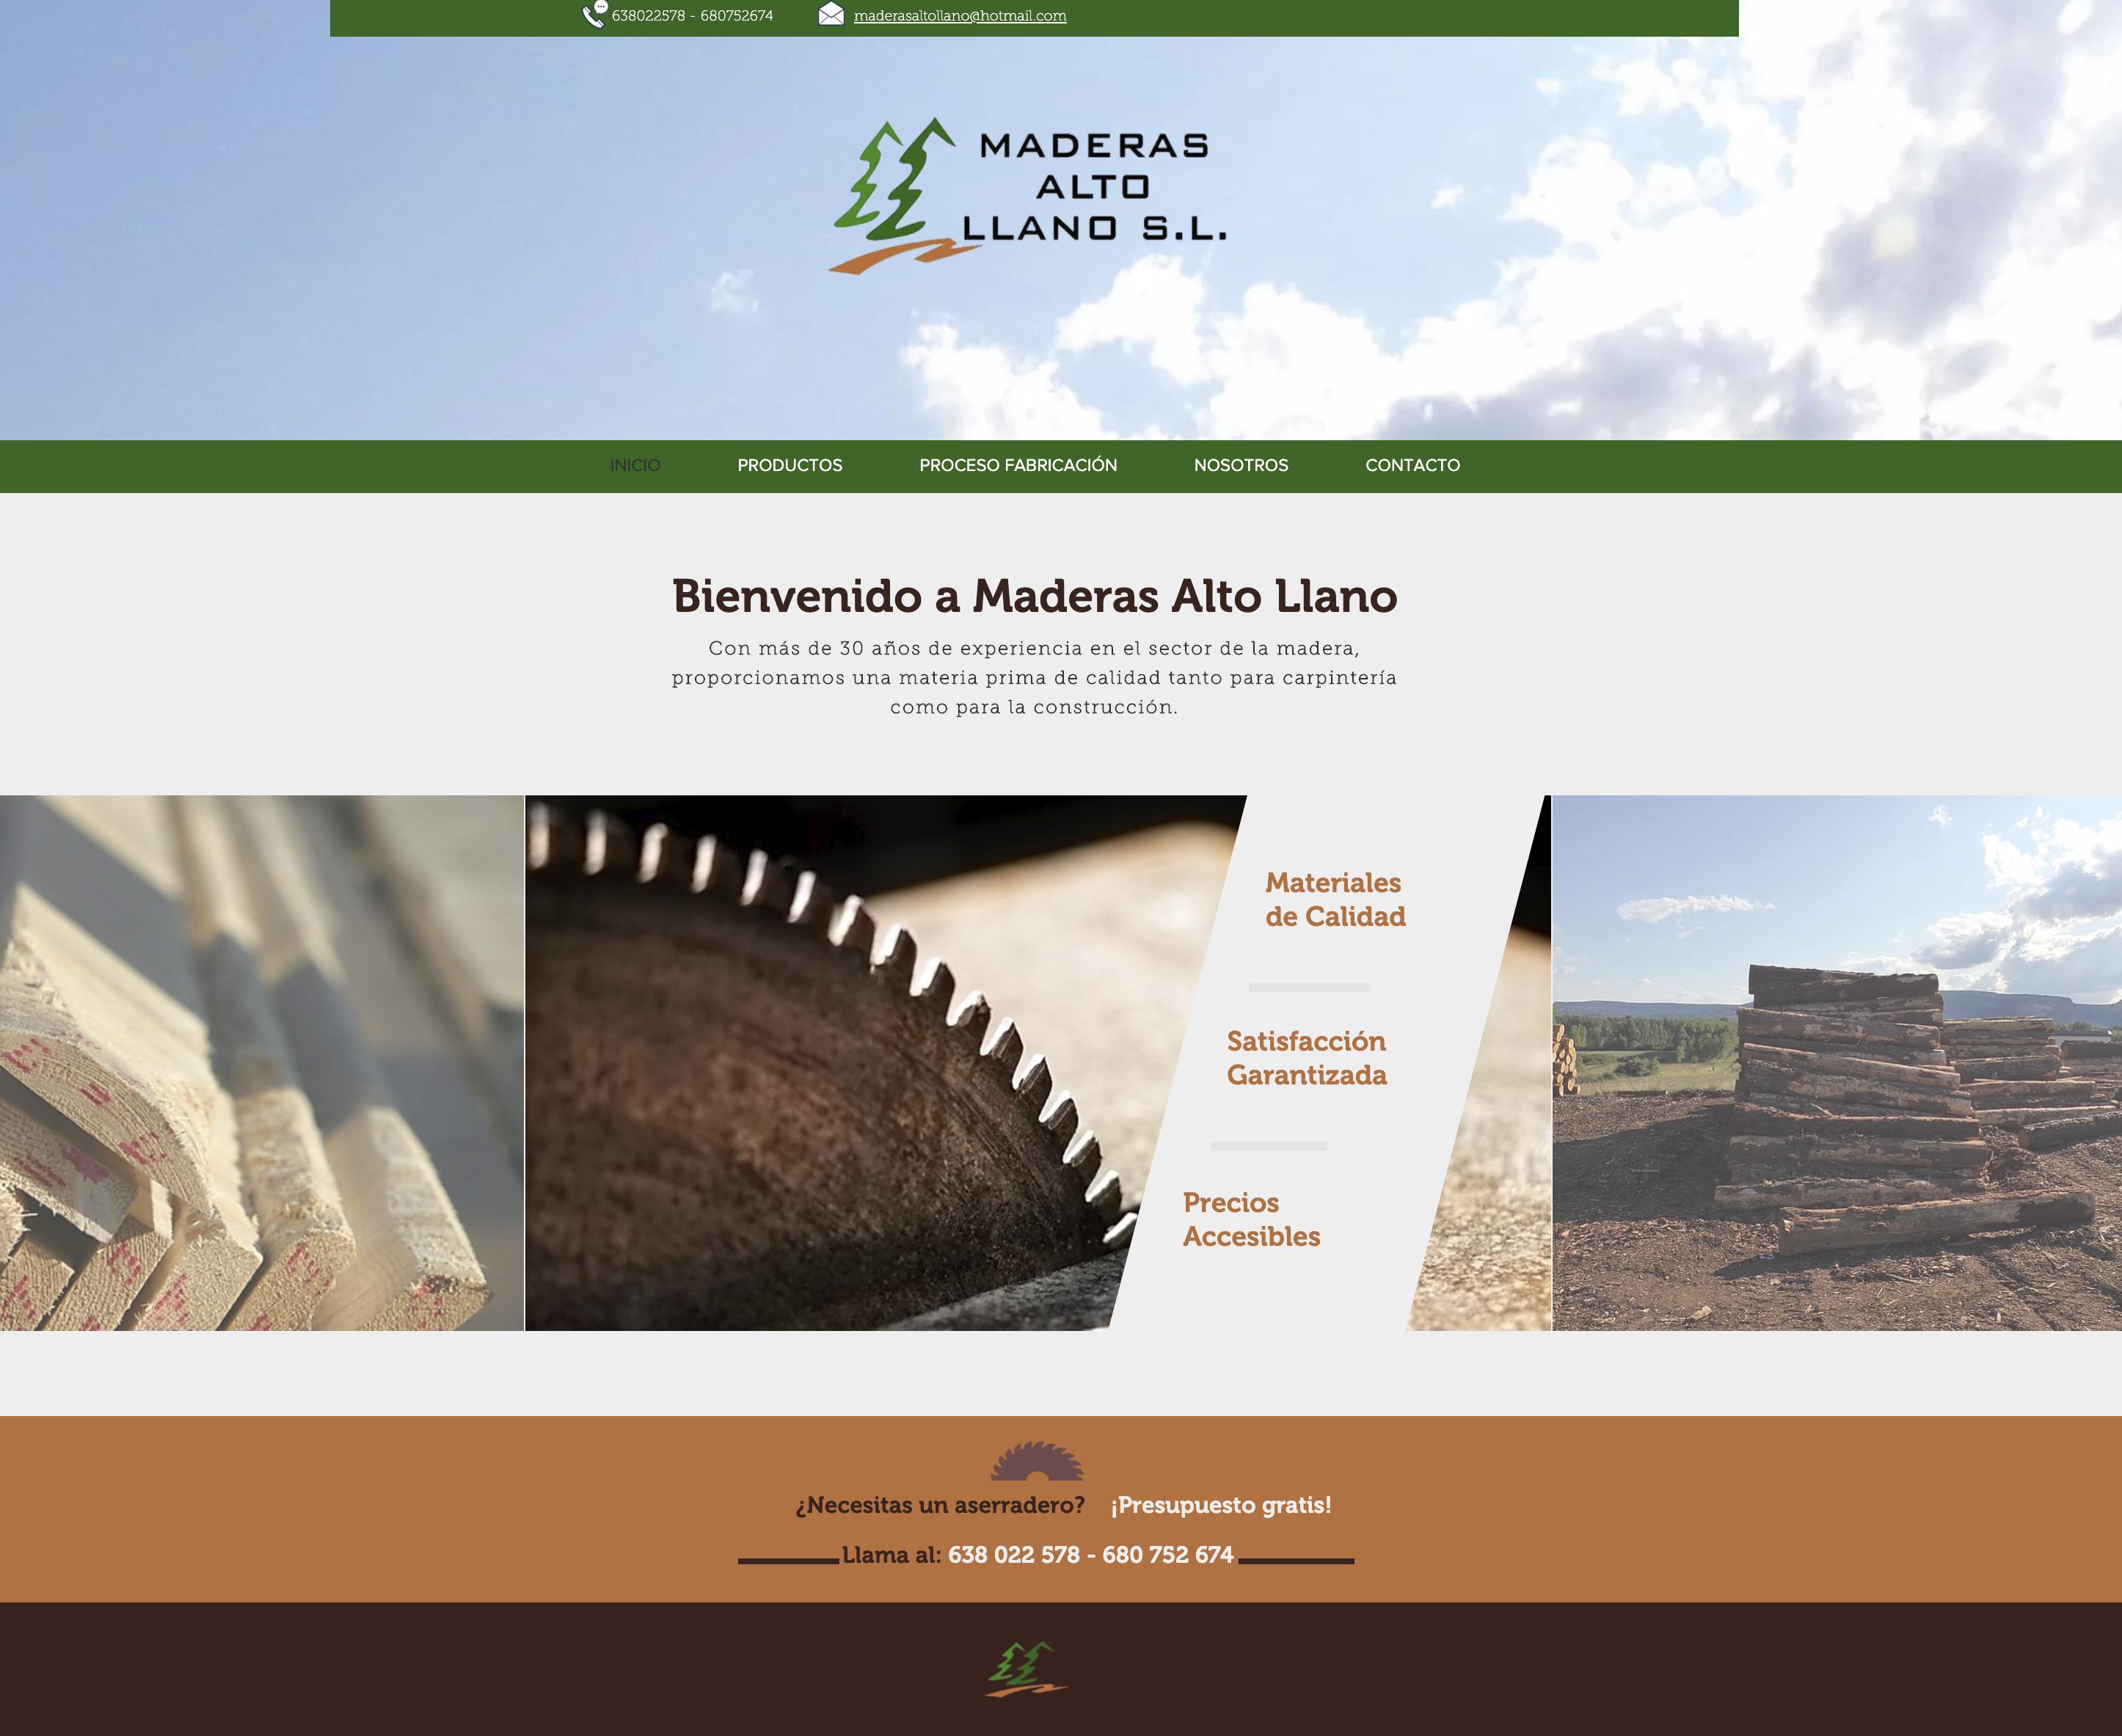 Maderas Alto Llano